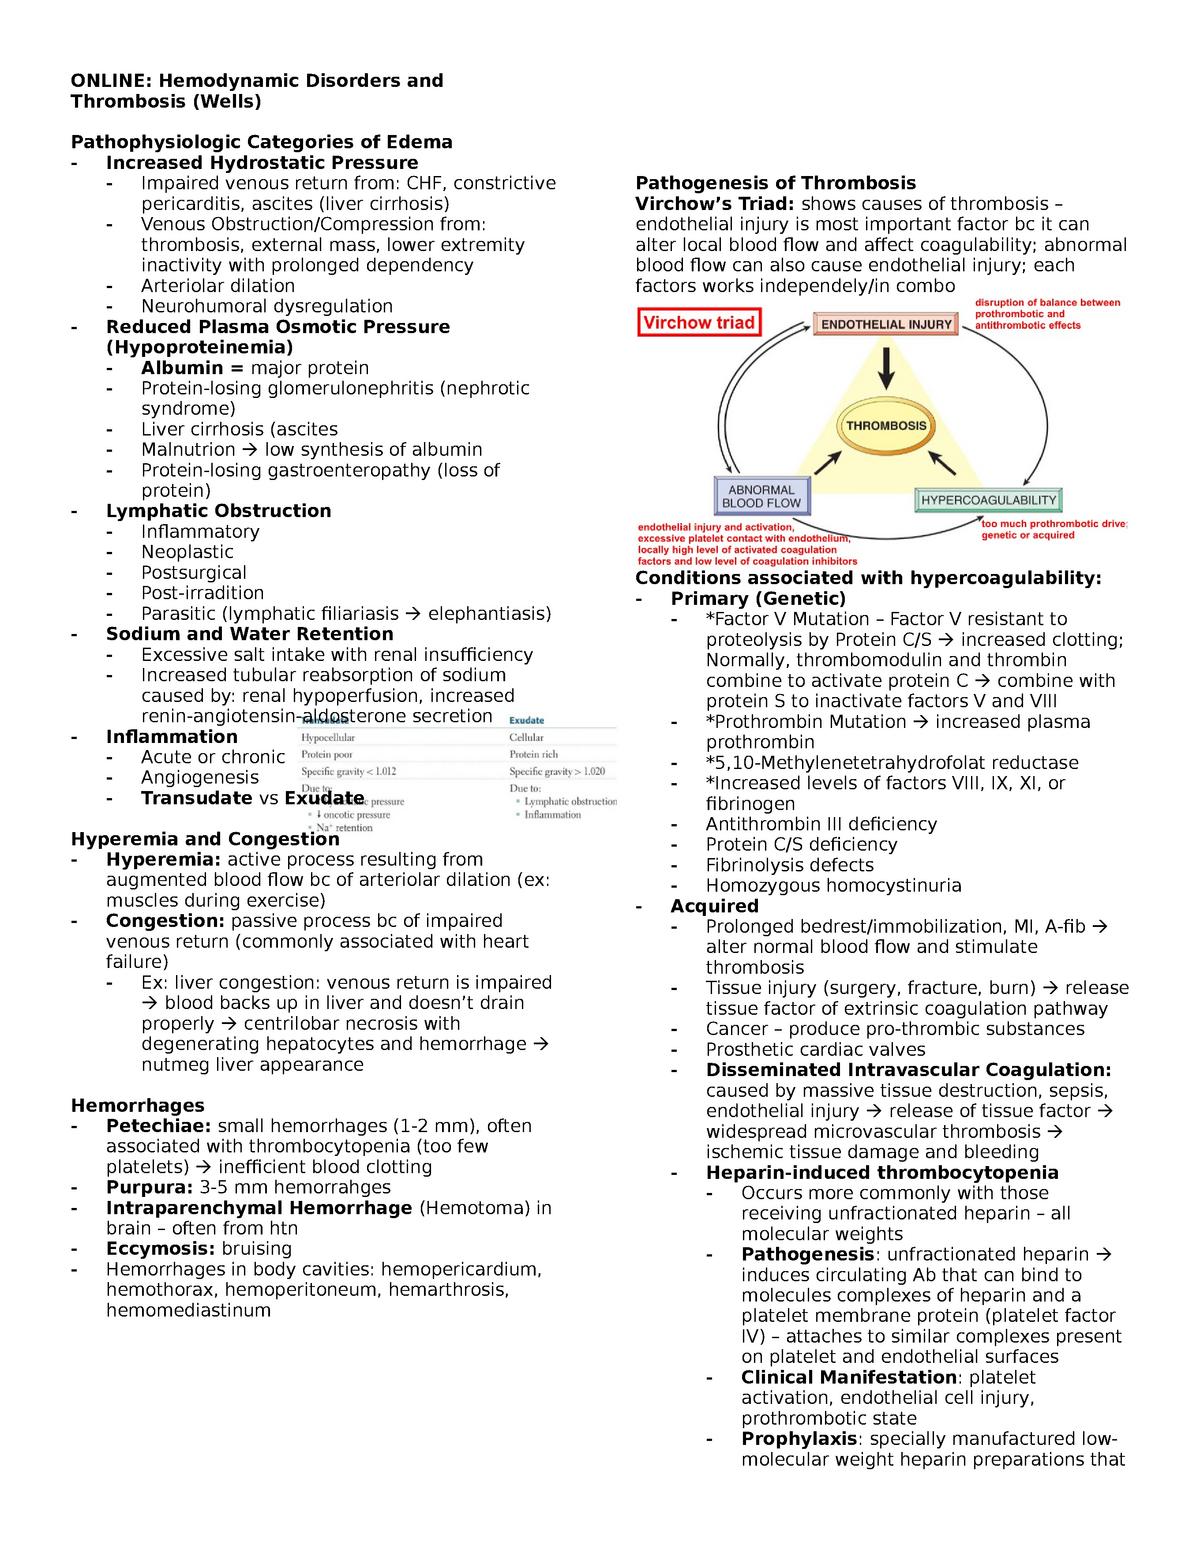 Online - Hemodynamic Disorders and Thrombosis (Wells) - MEID 609 30B